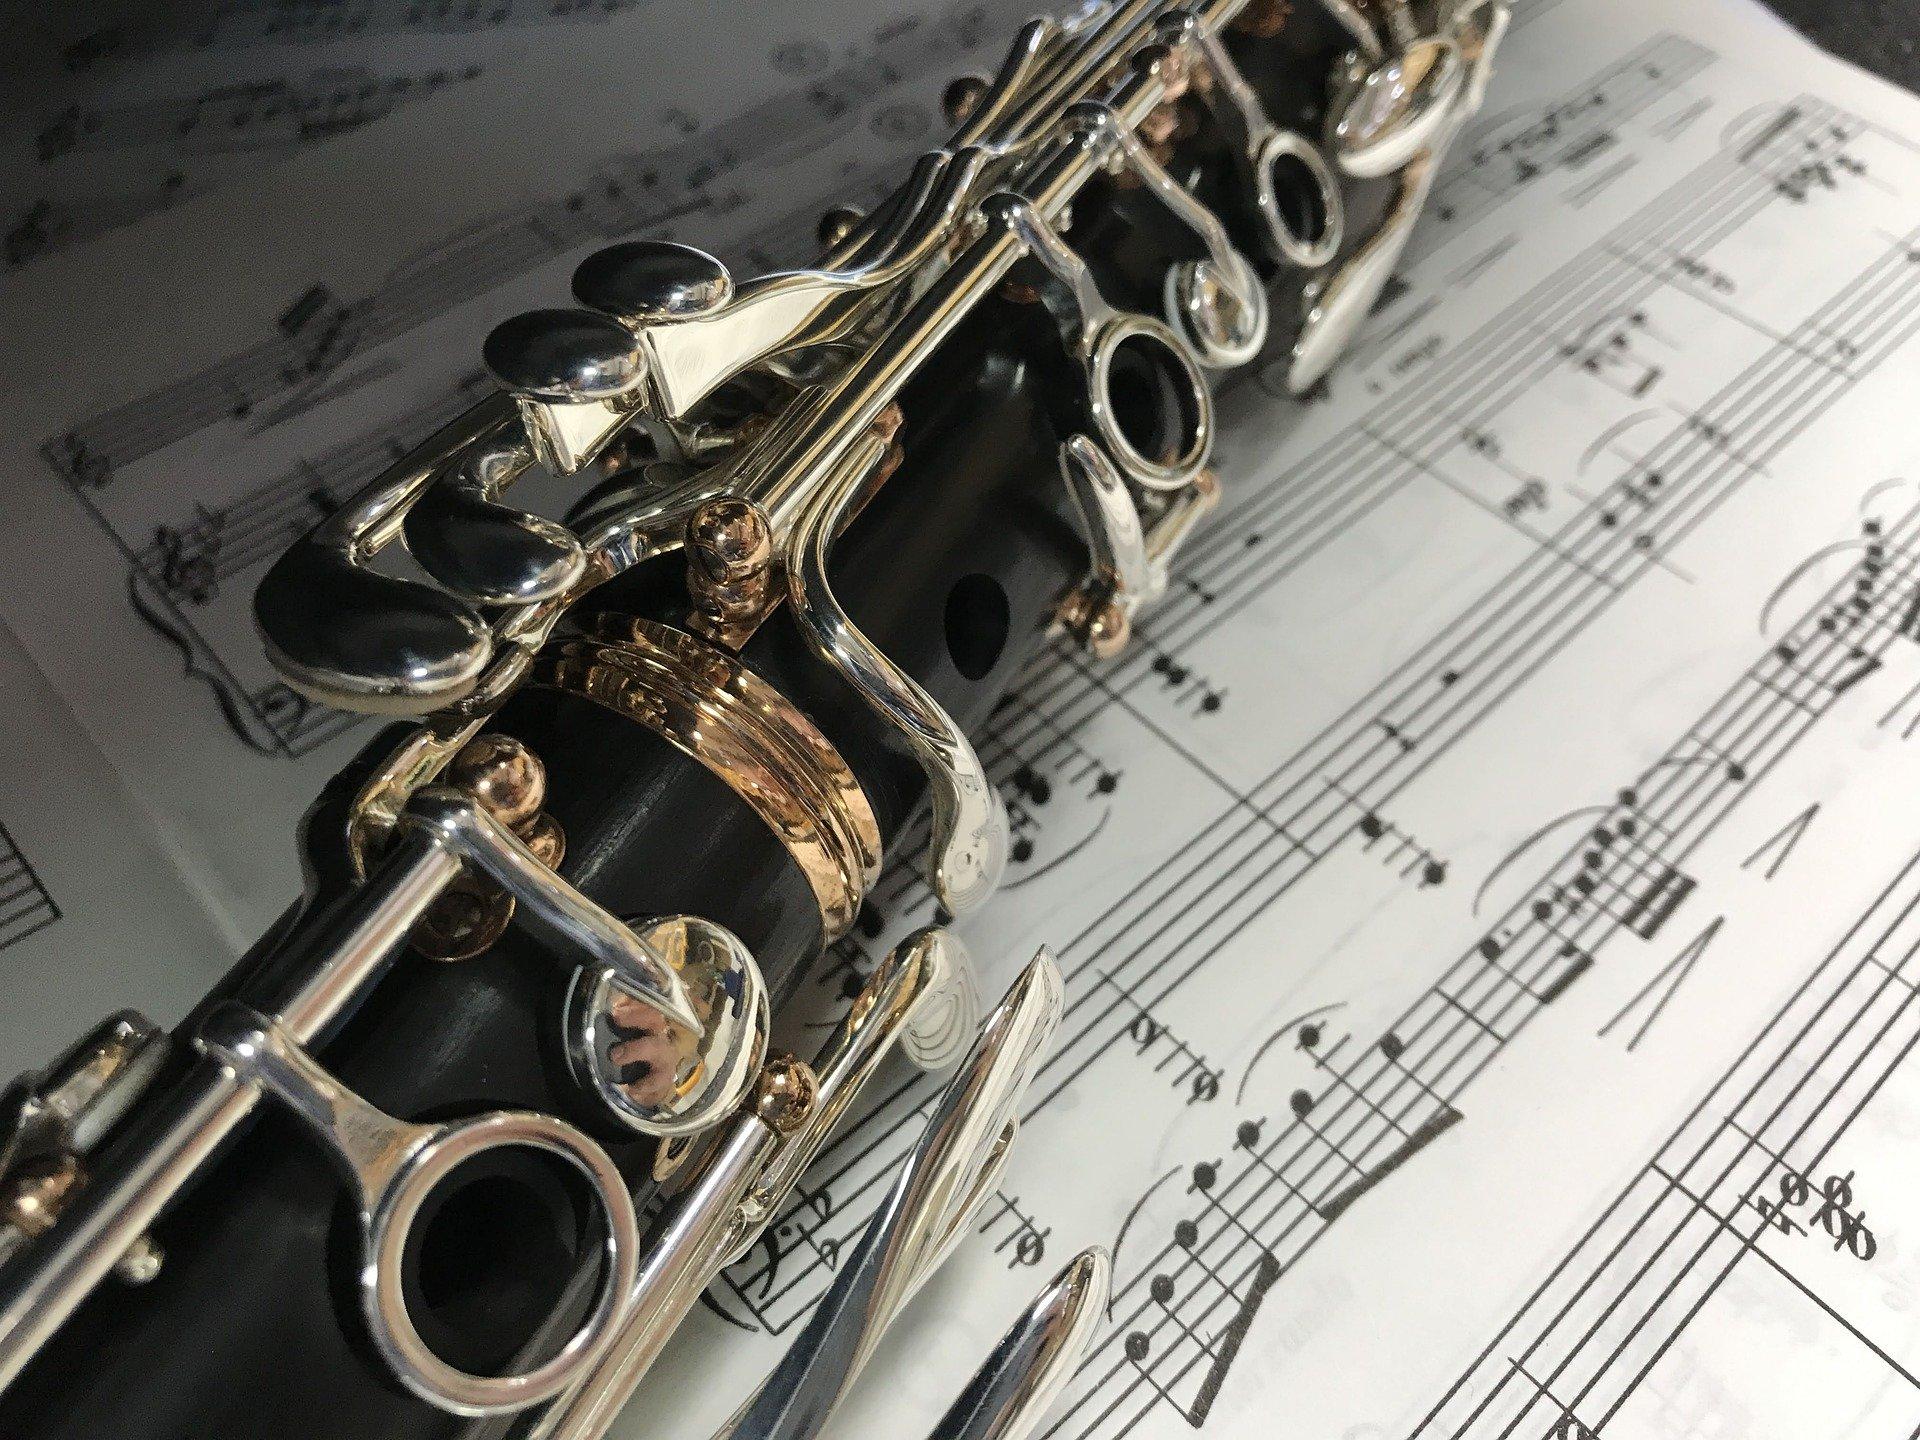 A clarinet laying on a scoresheet